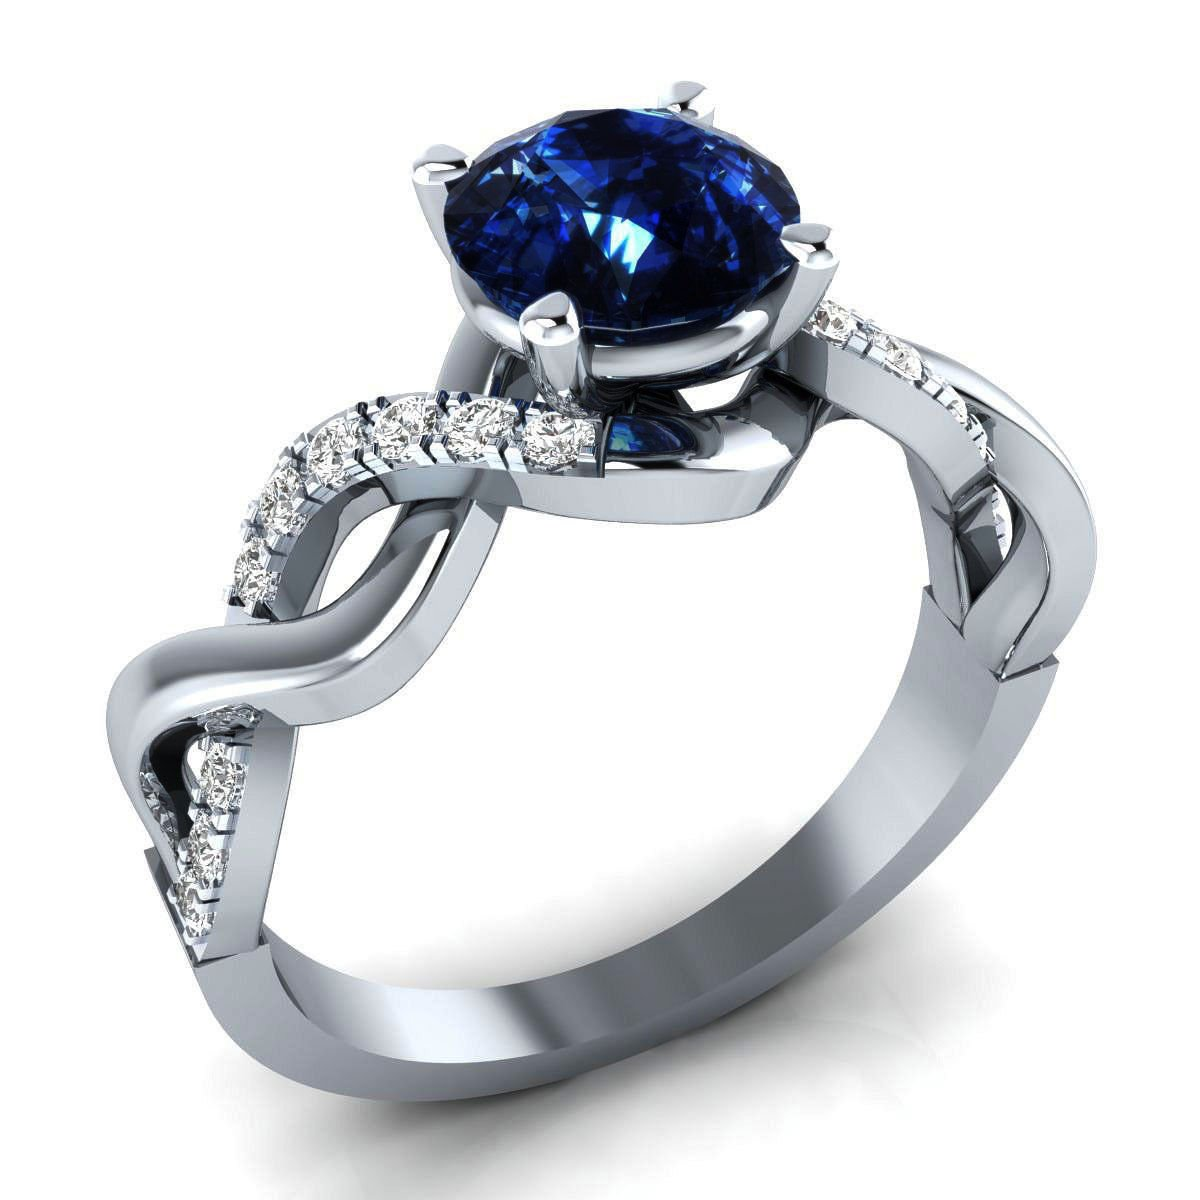 2.56ct White Simulated Diamond & Blue Color Stone 10k WG Engagement-Wedding Ring